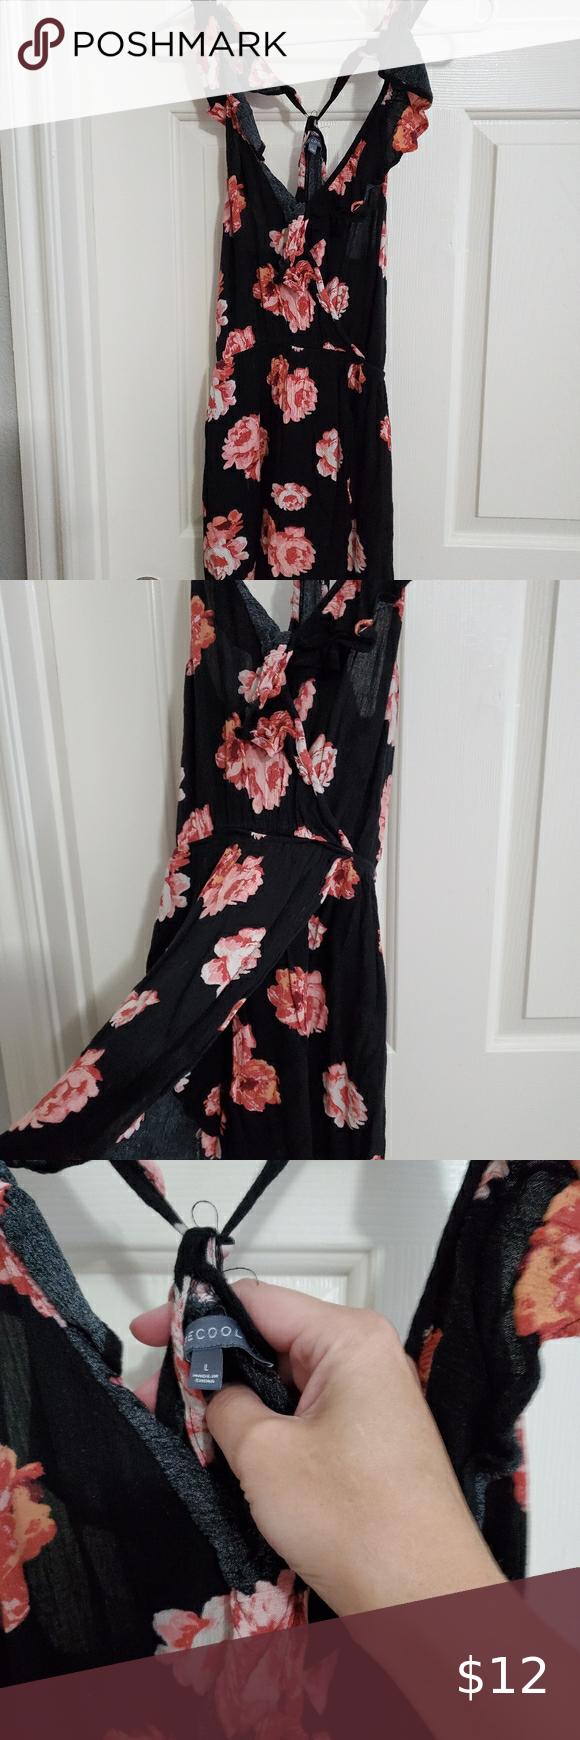 Black Dress With Pink Flowers Cute Summer Dresses Dresses Black Dress [ 1740 x 580 Pixel ]